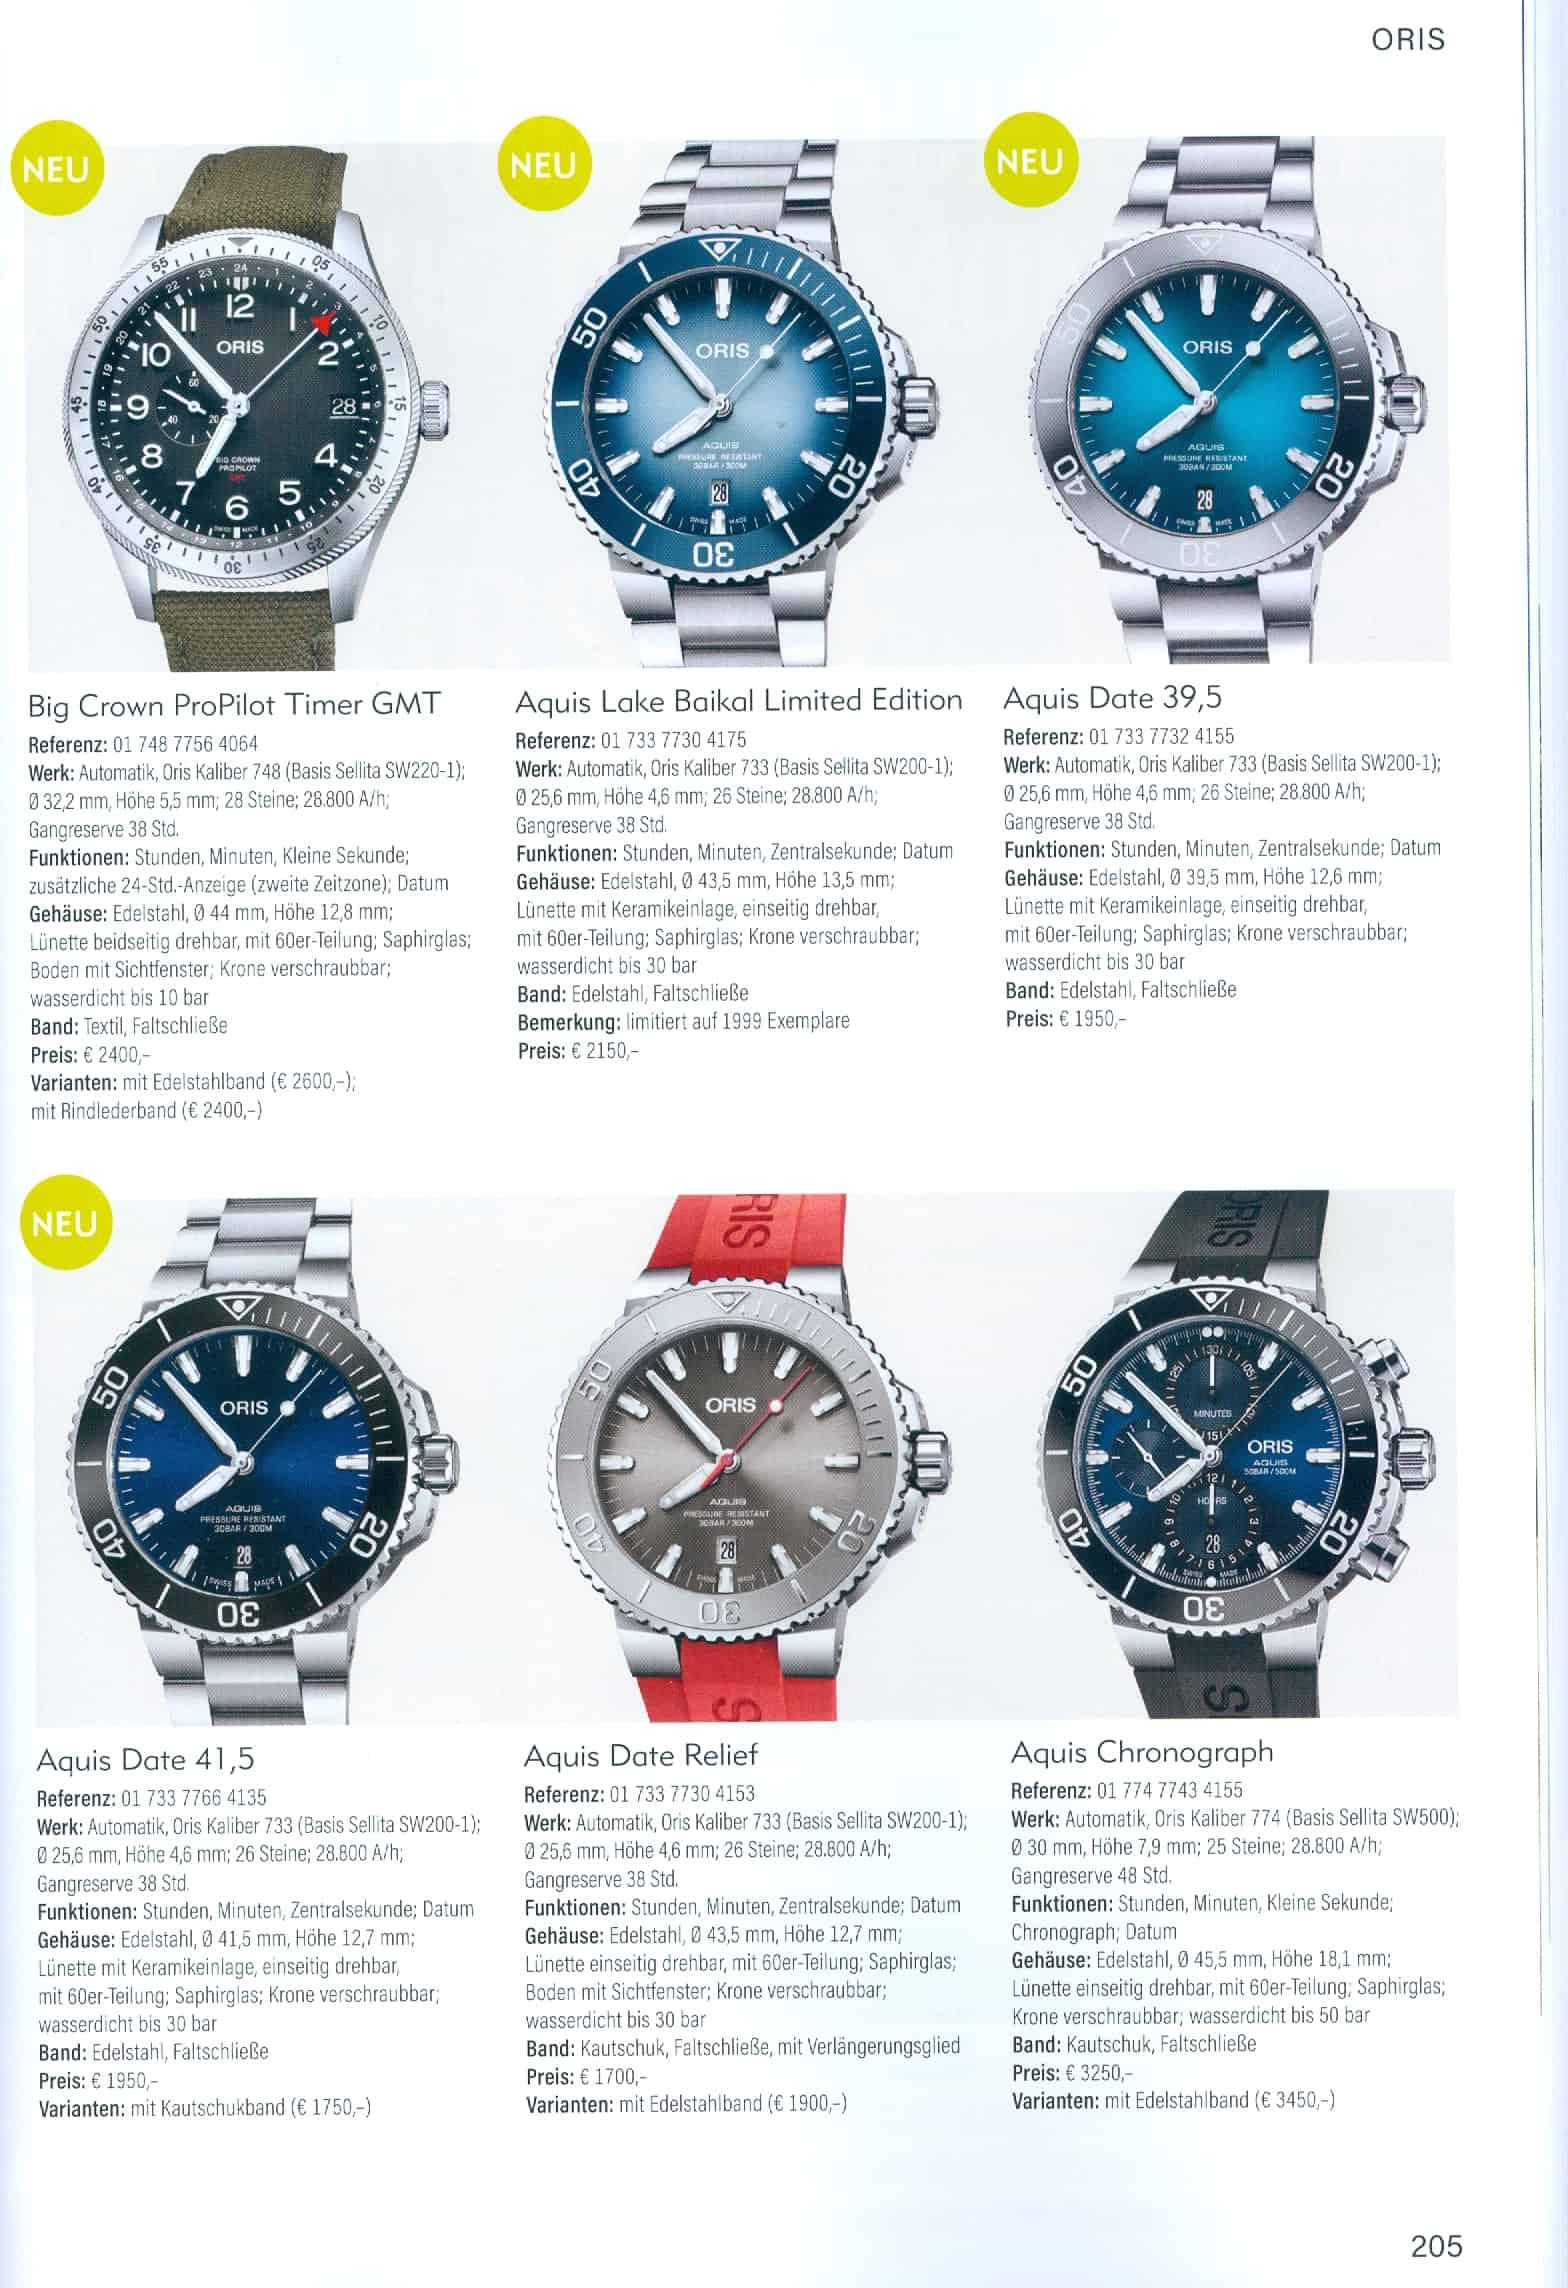 Armbanduhren Katalog Heel Verlag 2020 2021 Oris